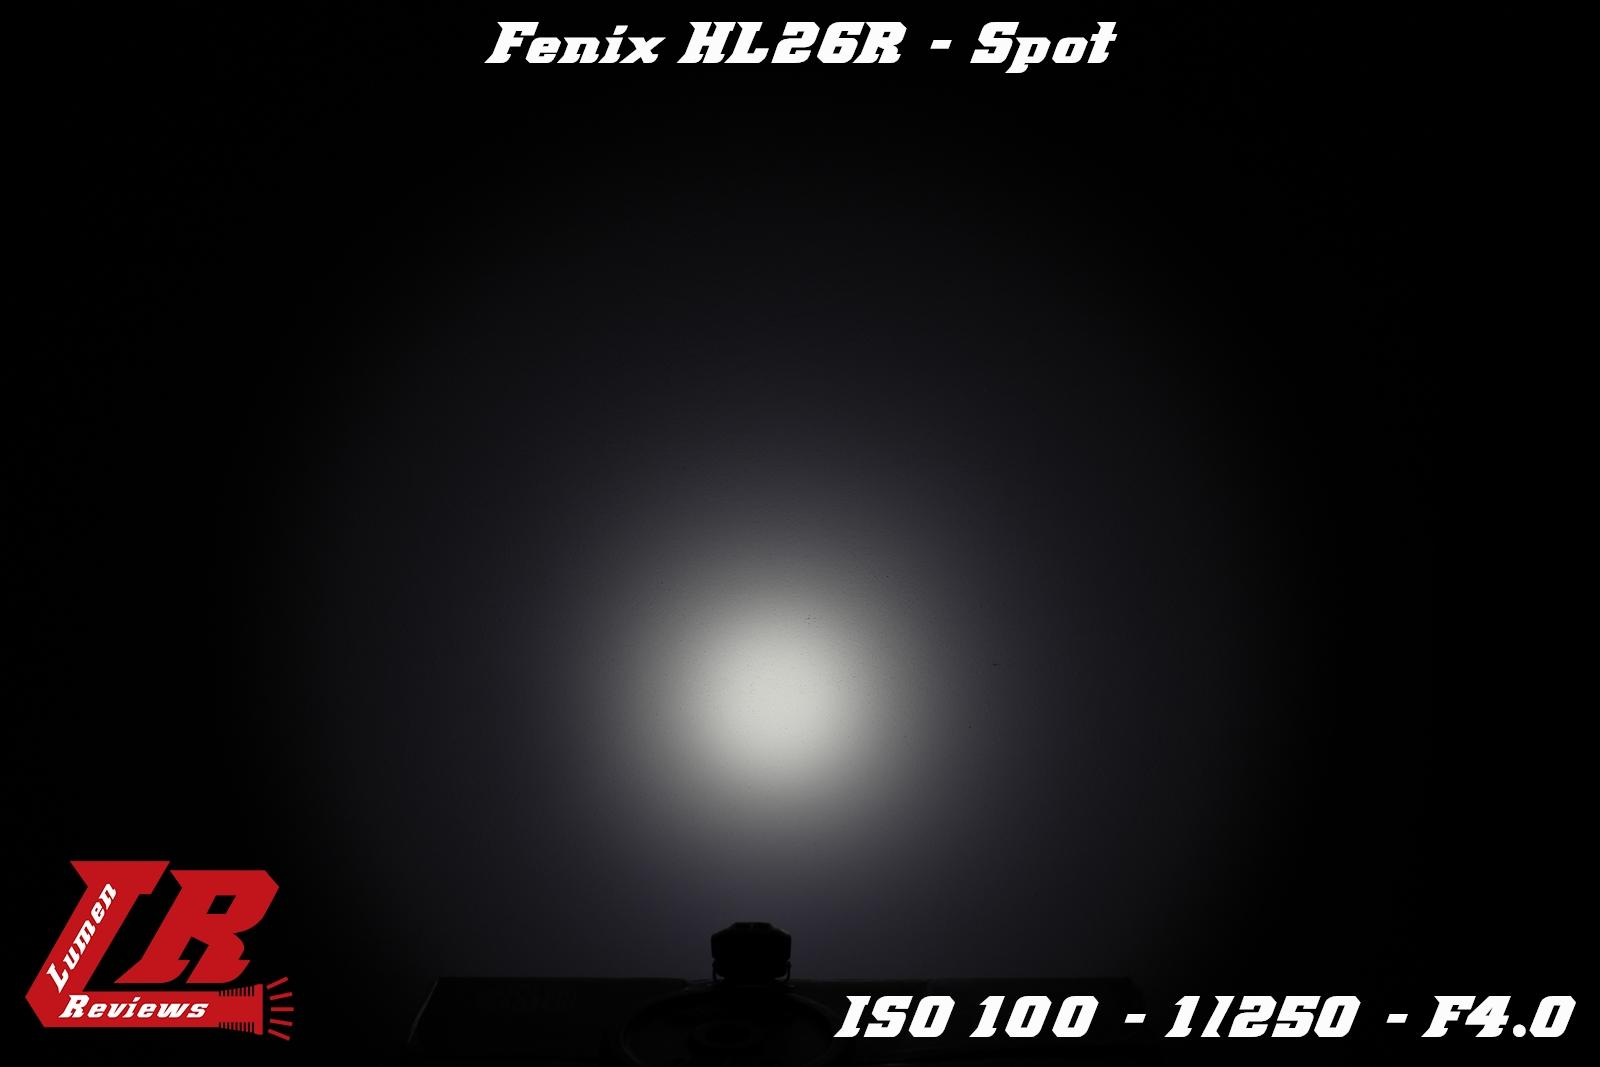 Fenix HL26R 20